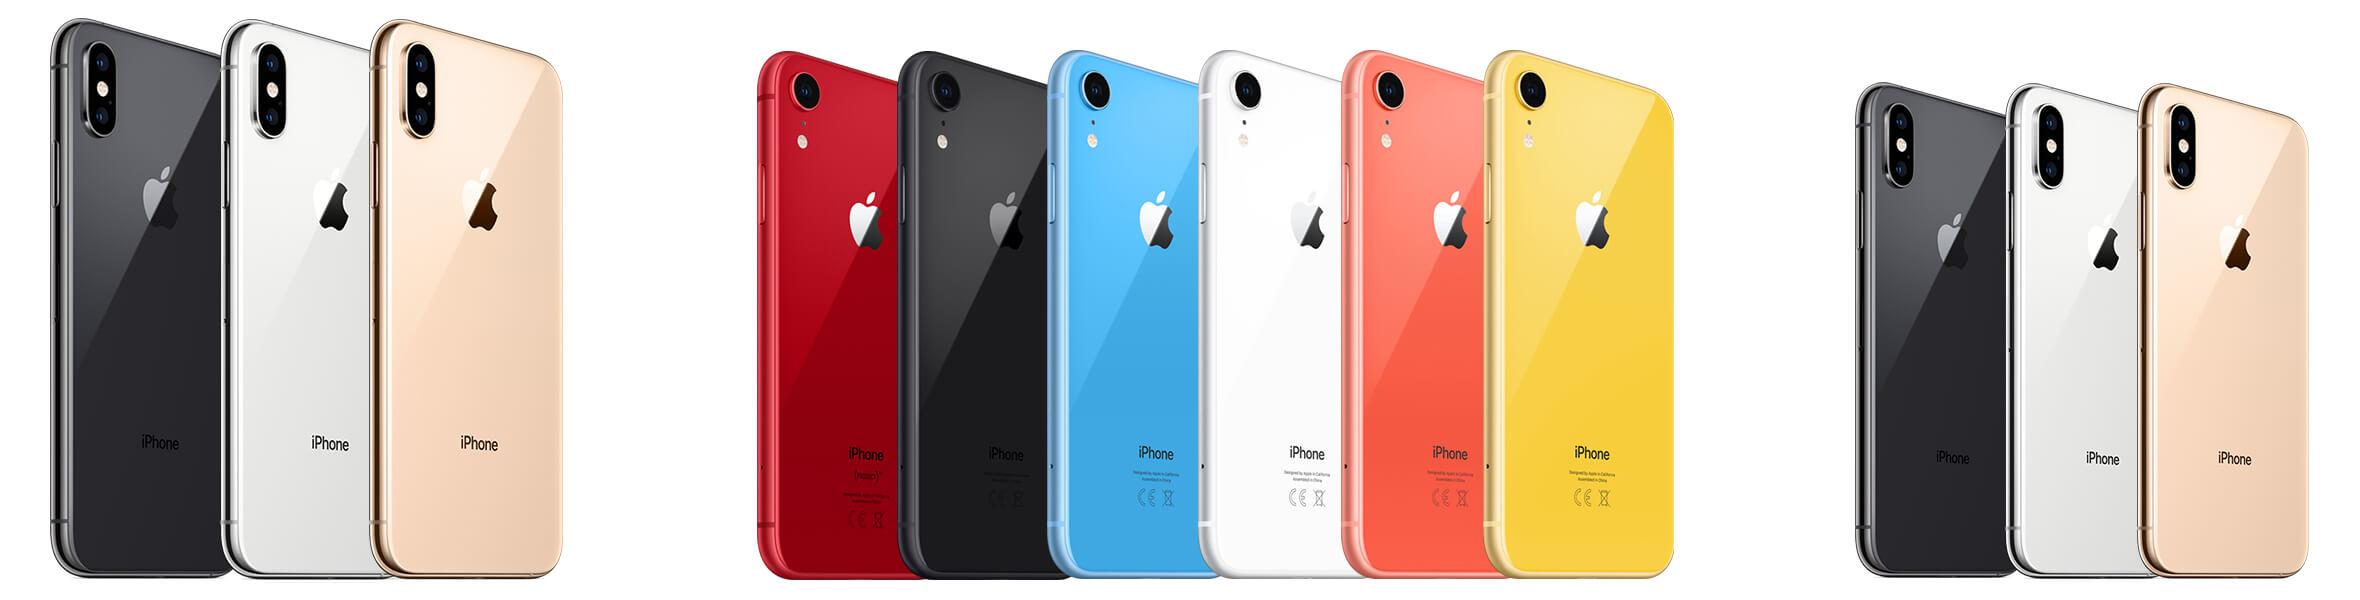 iPhone-Xs-Xr.jpg